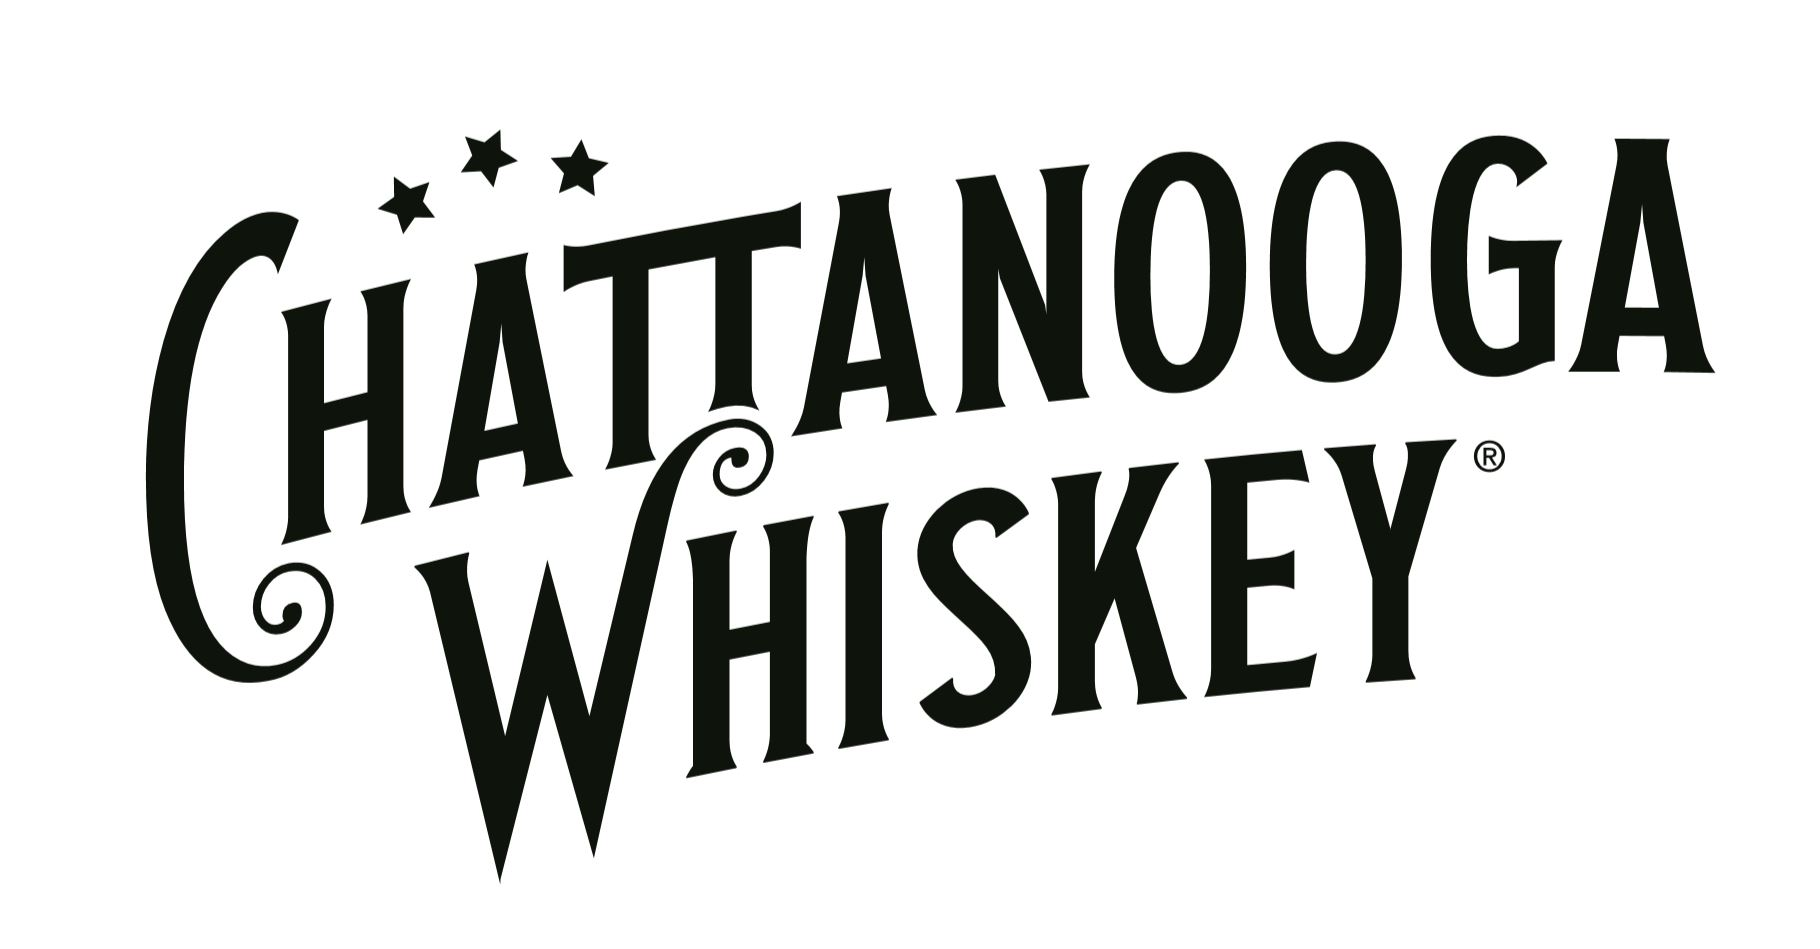 chatt whiskey logo.JPG